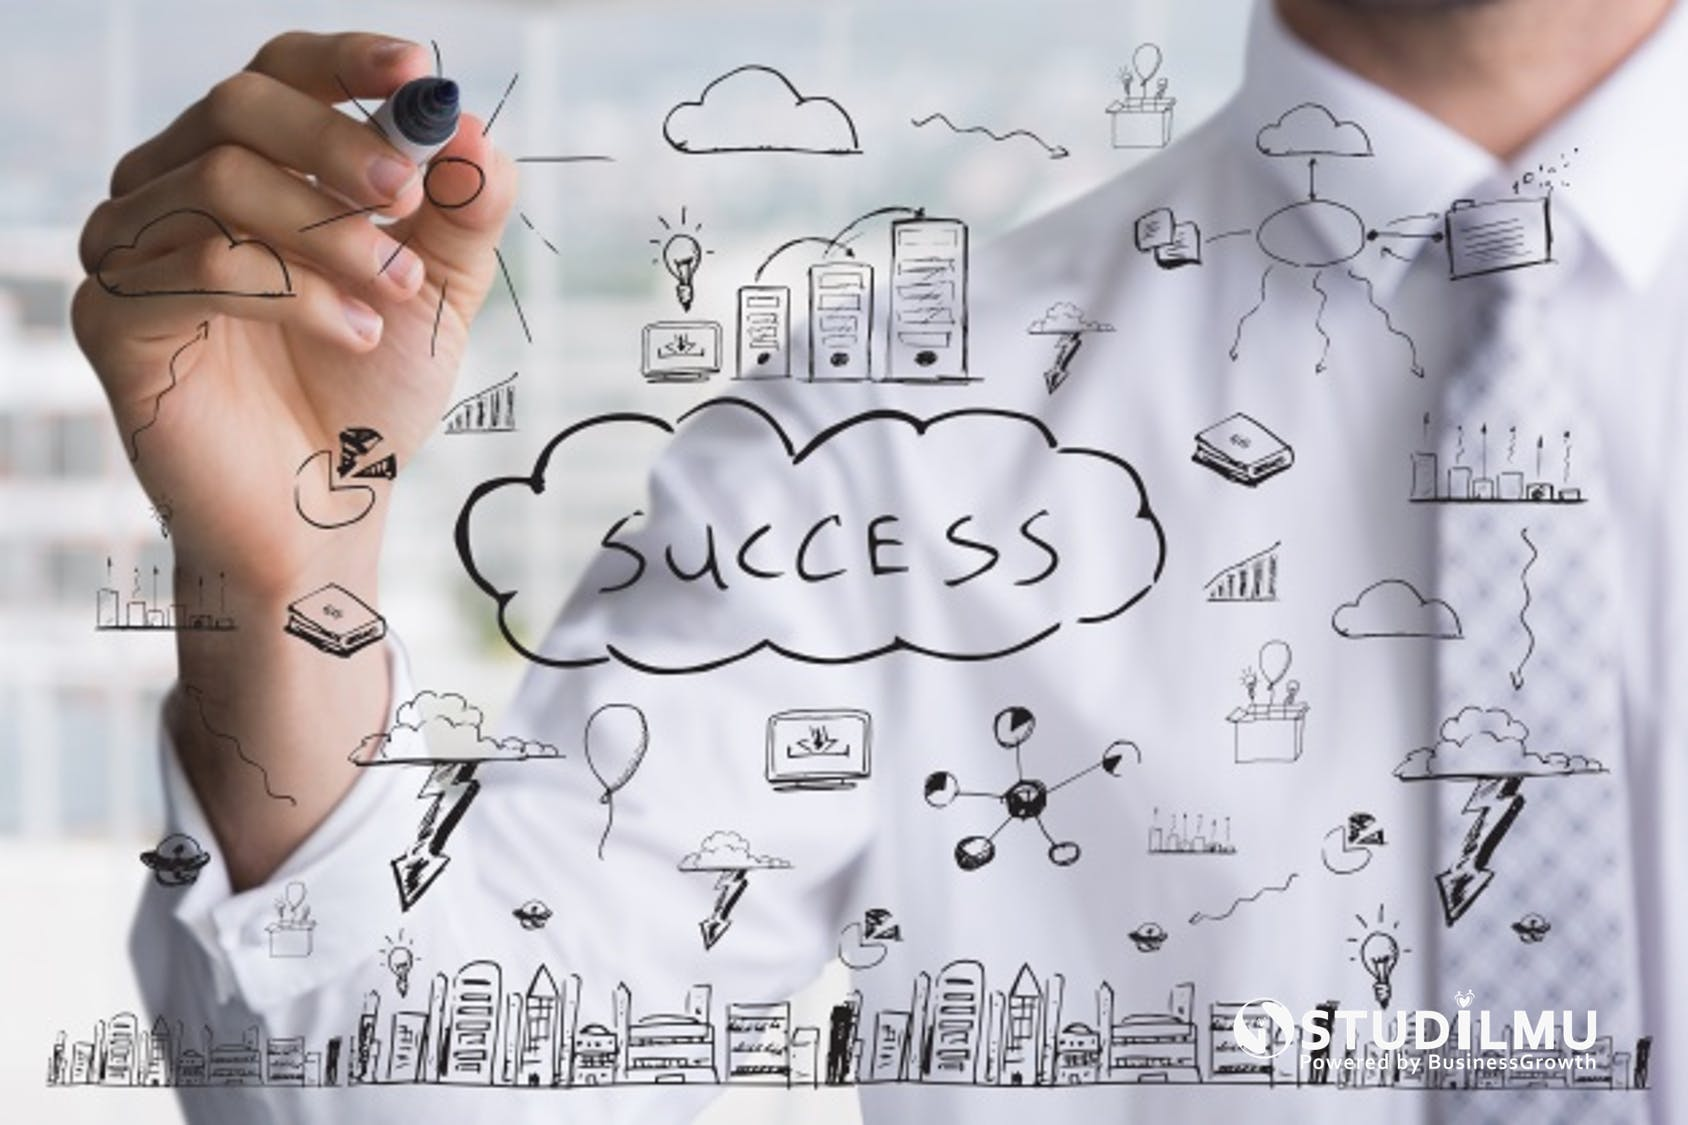 STUDILMU Career Advice - 7 Kunci Kesuksesan dan Kepuasan Kerja